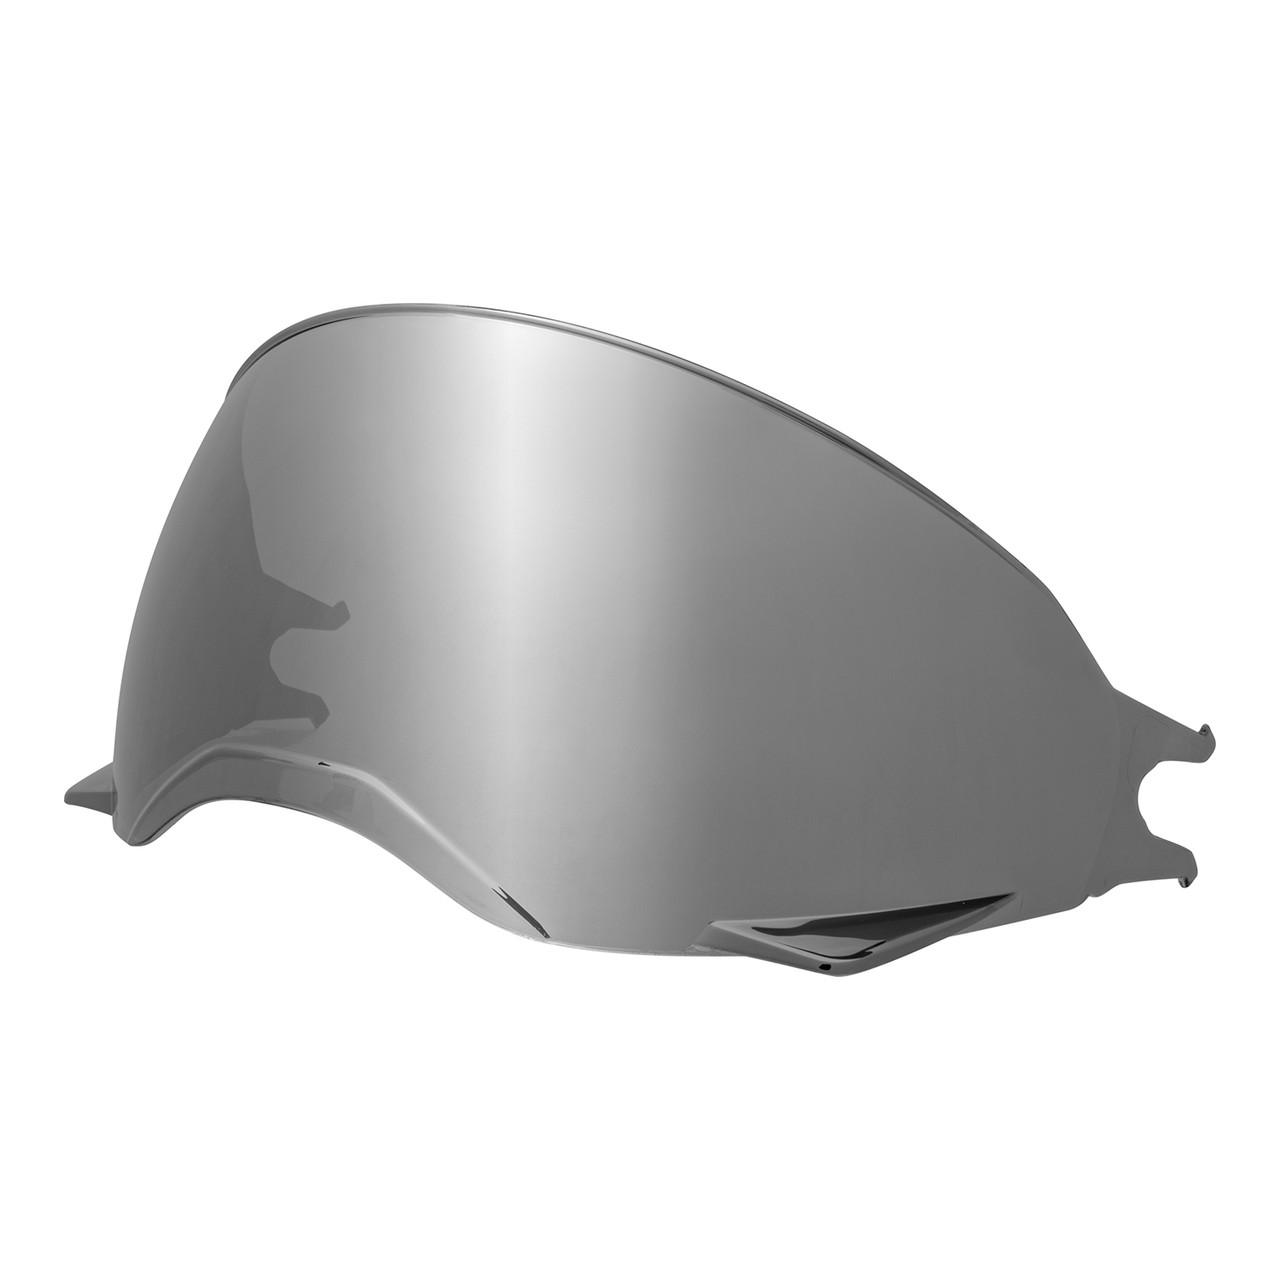 Bell MX-9 Adventure Face Shield Dark Gold Mirror Iridium